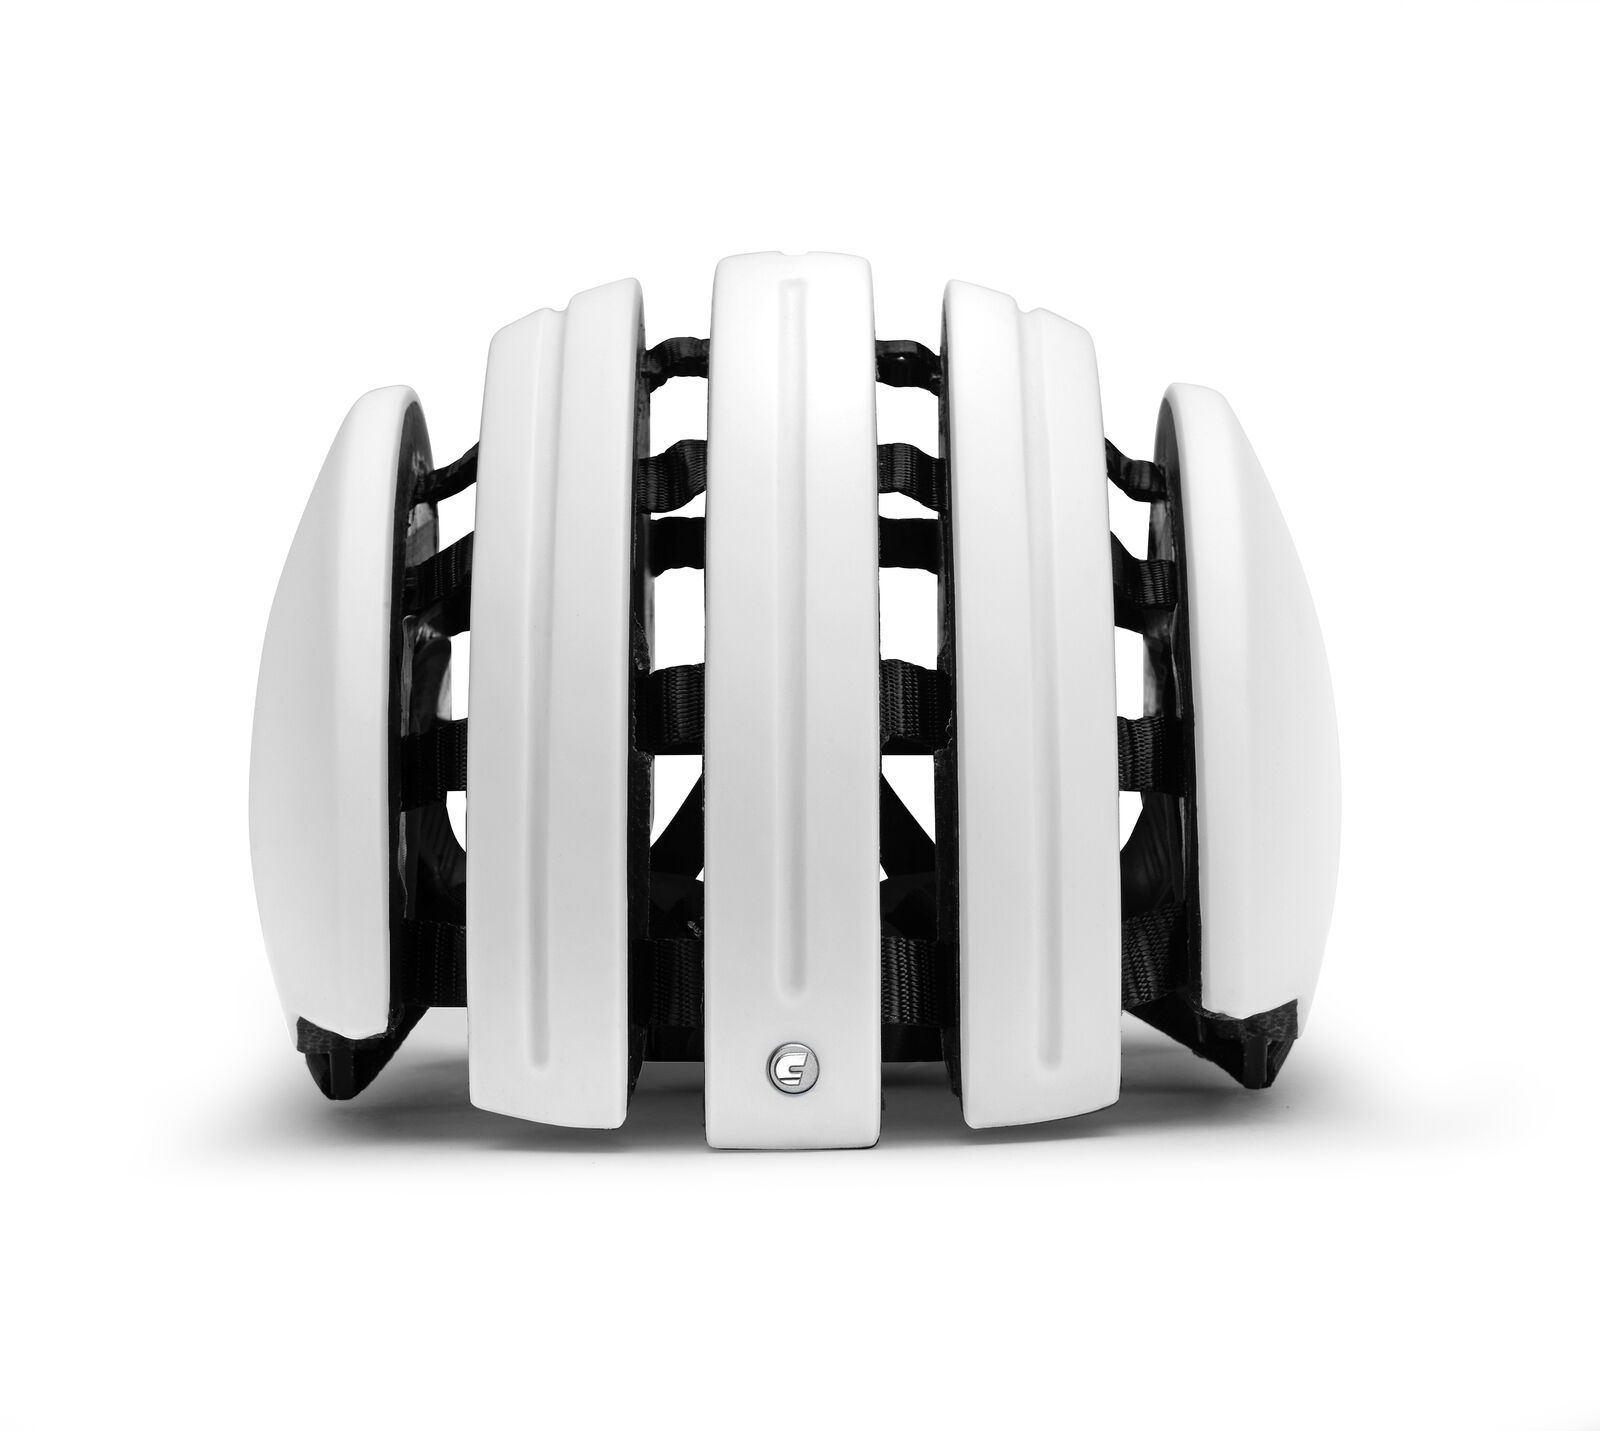 Carrera Fahrradhelm FOLDAB PREM_C  white Unifarben faltbar  sale online save 70%